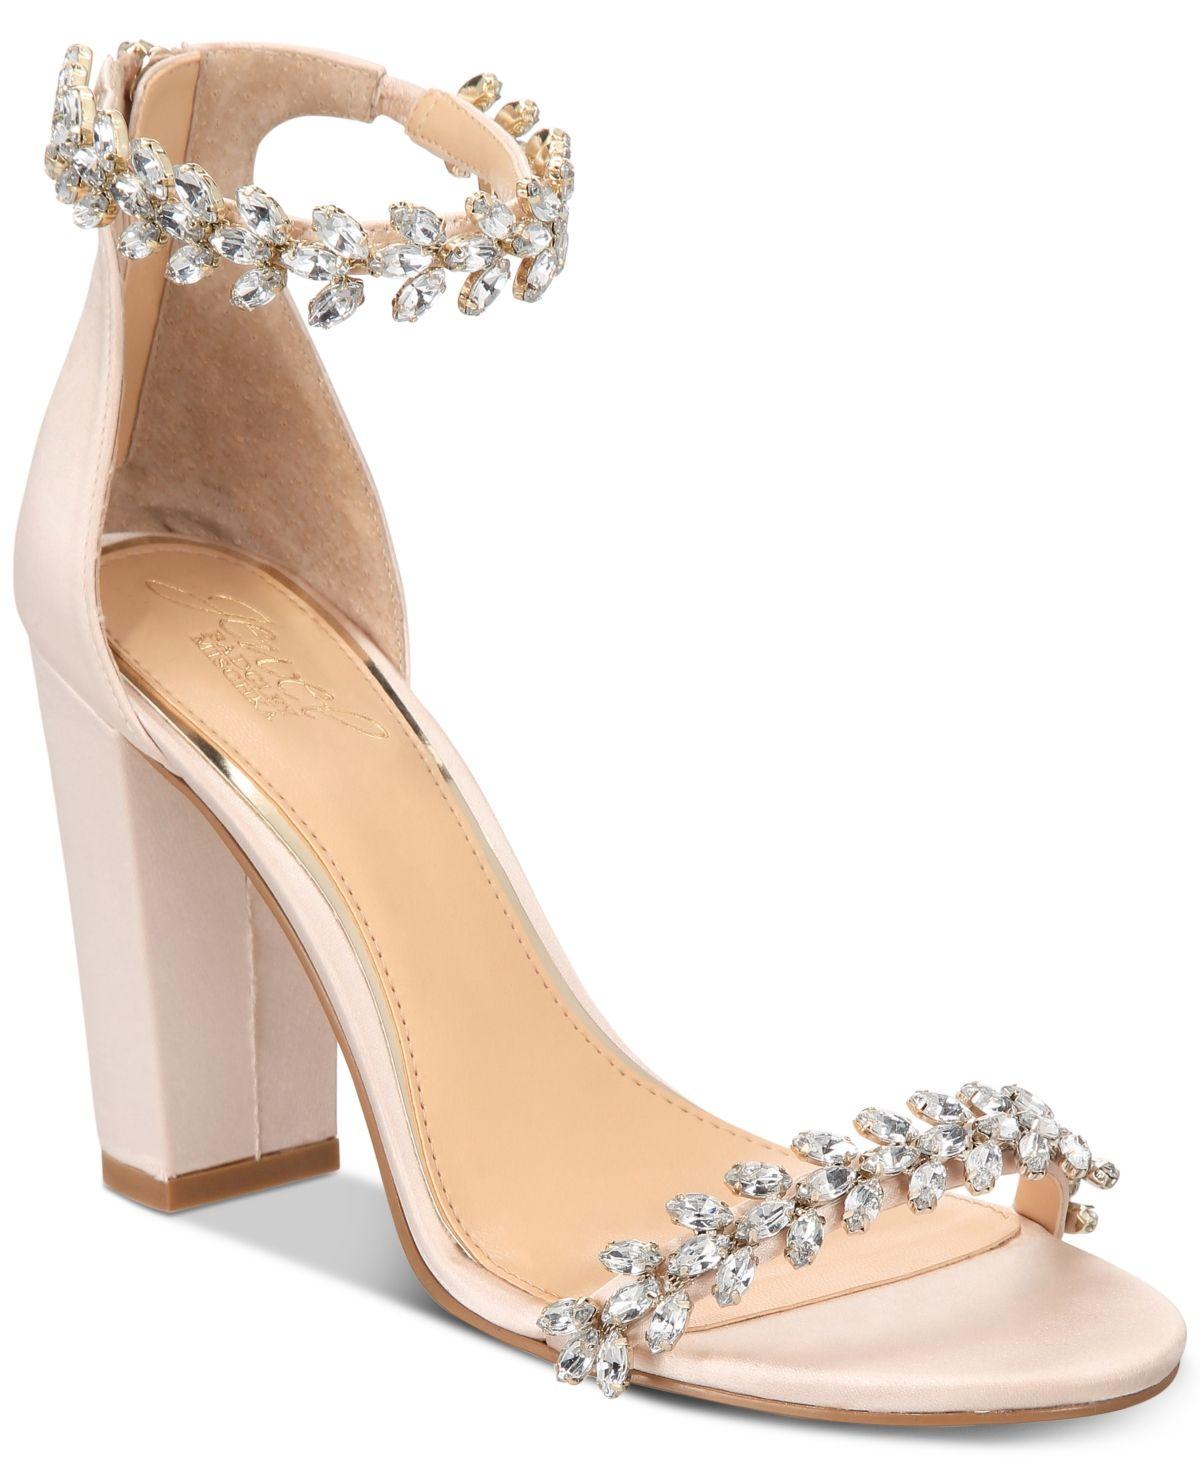 Jewel Badgley Mischka Mayra Evening Sandals & Reviews - Heels & Pumps - Shoes - Macy's